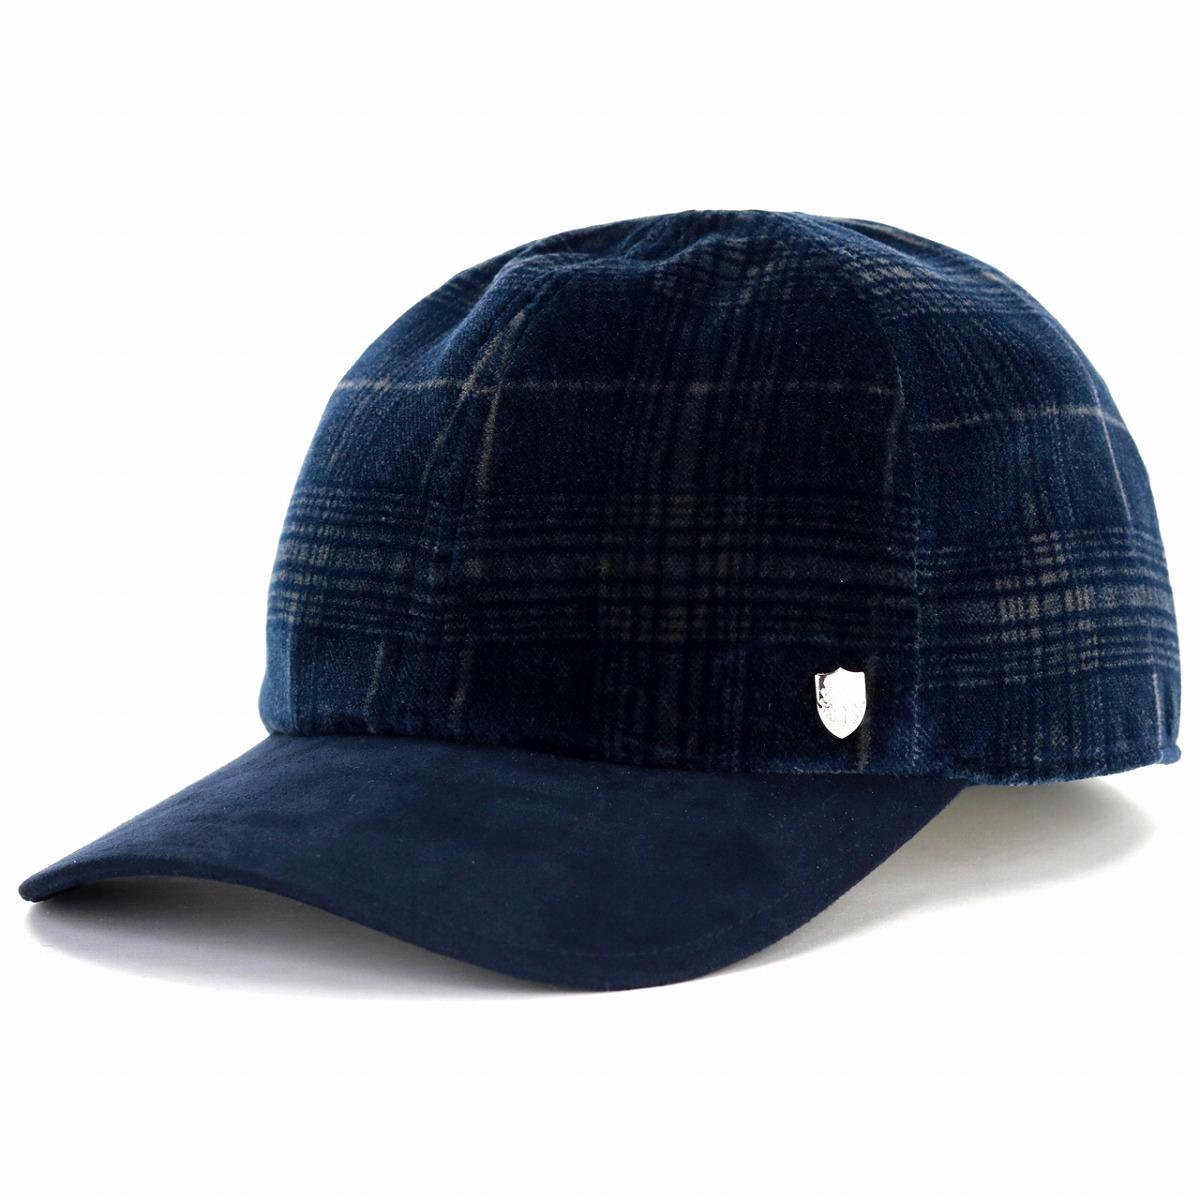 d5e9fceecd2 Dark blue navy  baseball cap  man Christmas present hat made in size  baseball cap M L LL size adjustment Pontoglio Belvet Japan which DAKS cap  men check ...